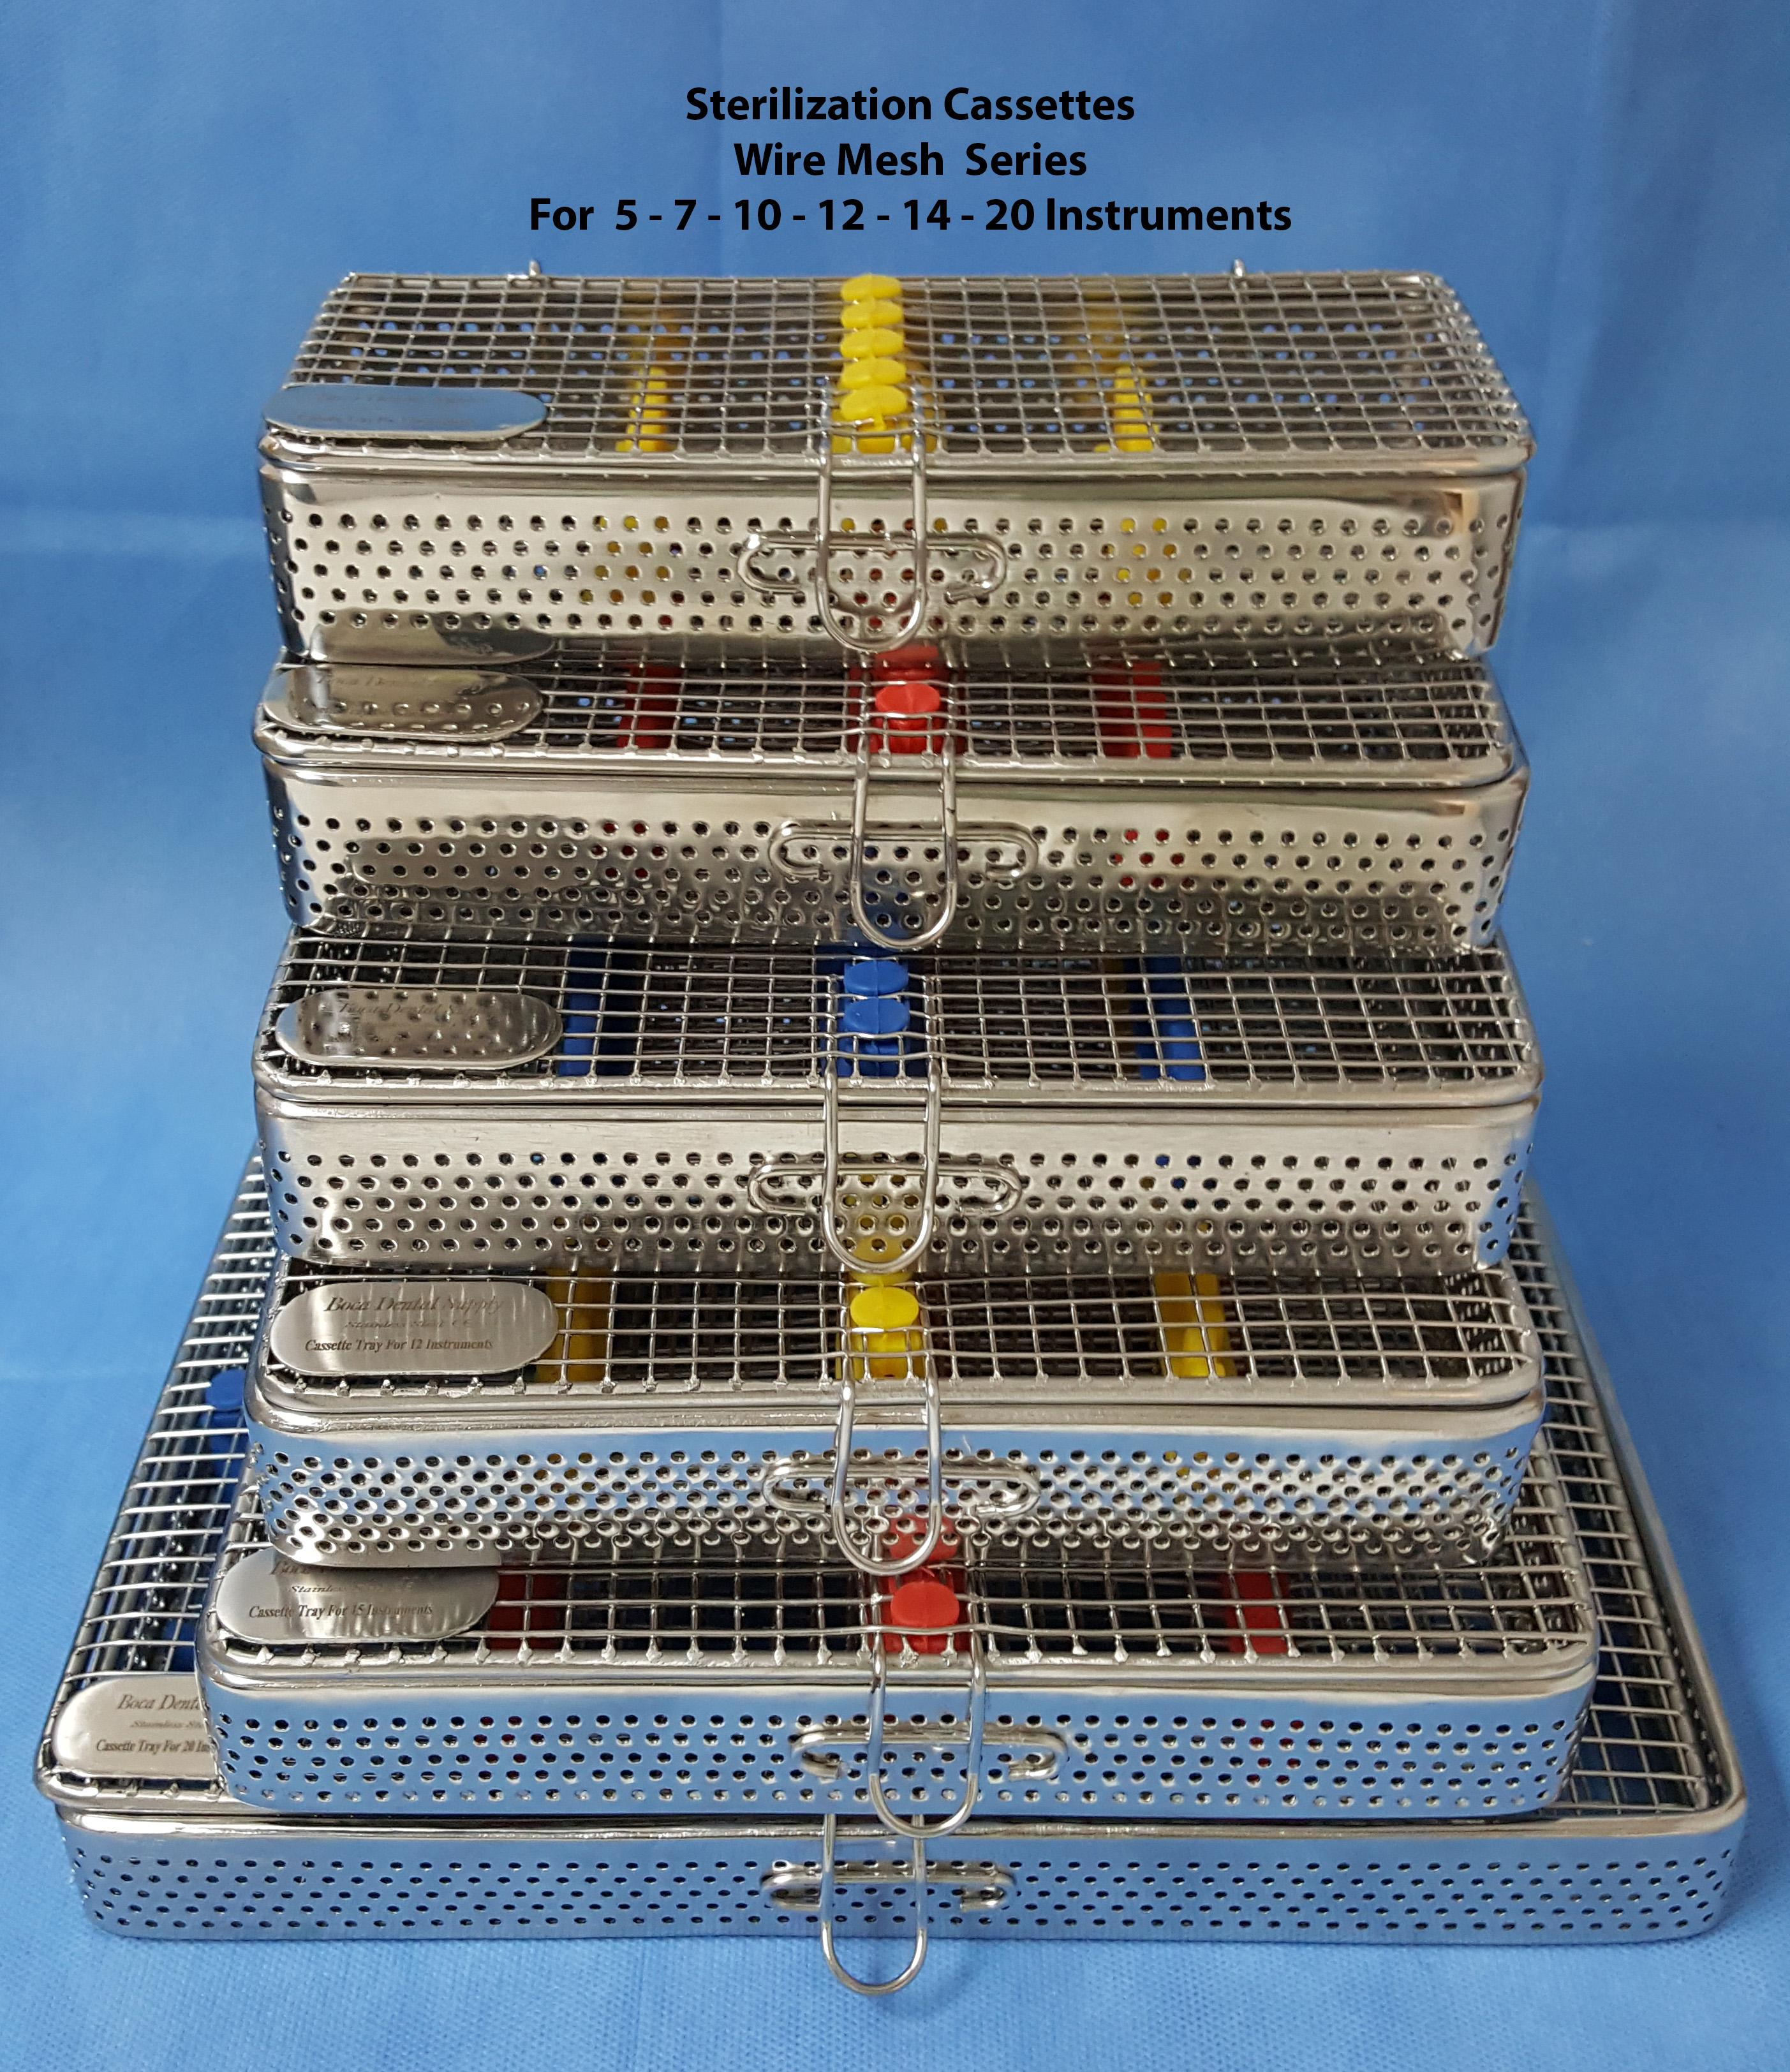 sterilization-cassettes-wire-mesh-5-7-10-12-14-20.jpg